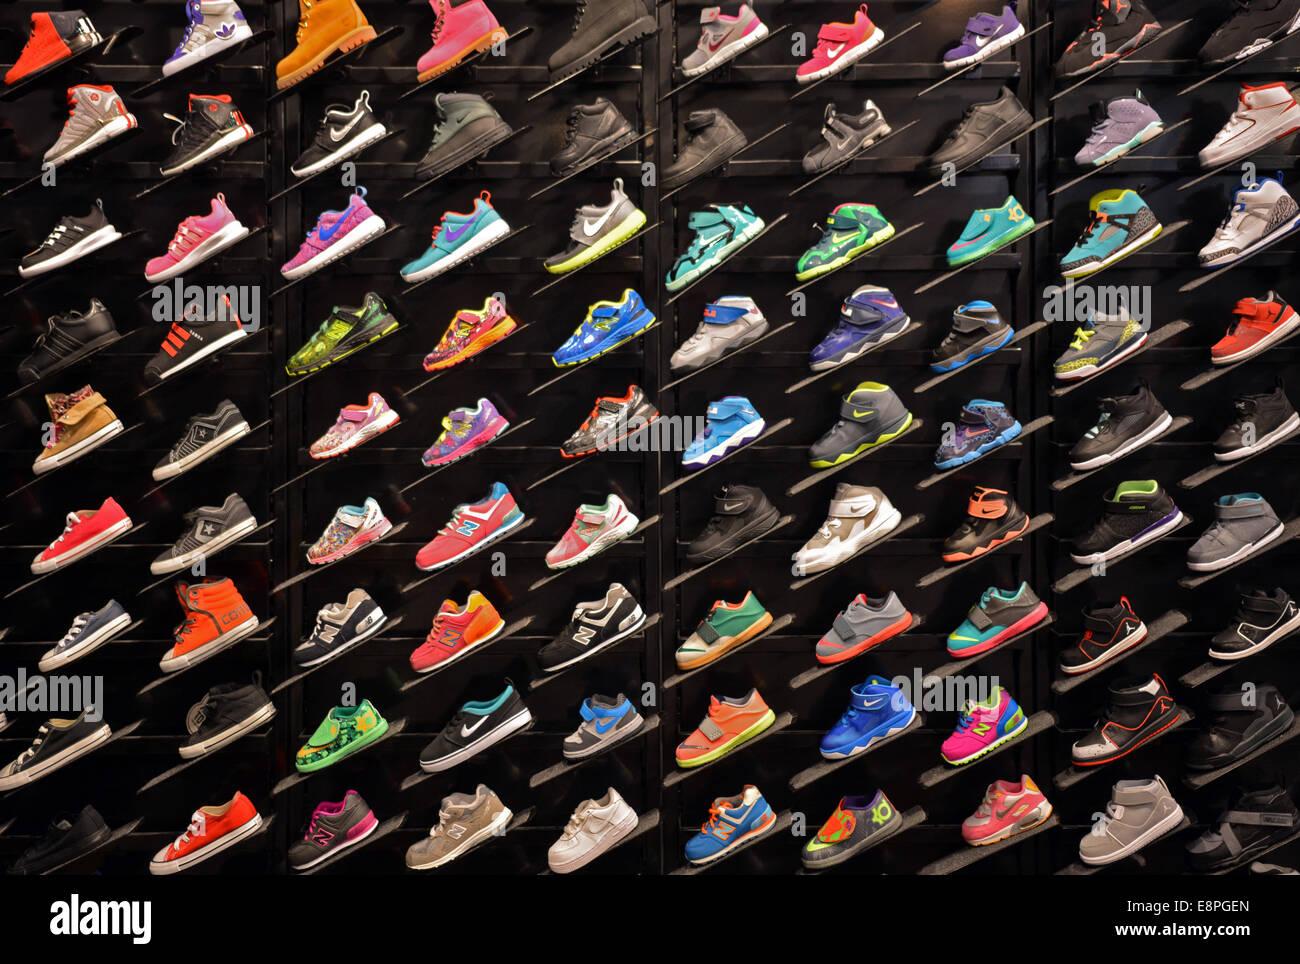 prima qualità 2019 professionista di prim'ordine Display a colori ai bambini di scarpe da ginnastica a Foot ...